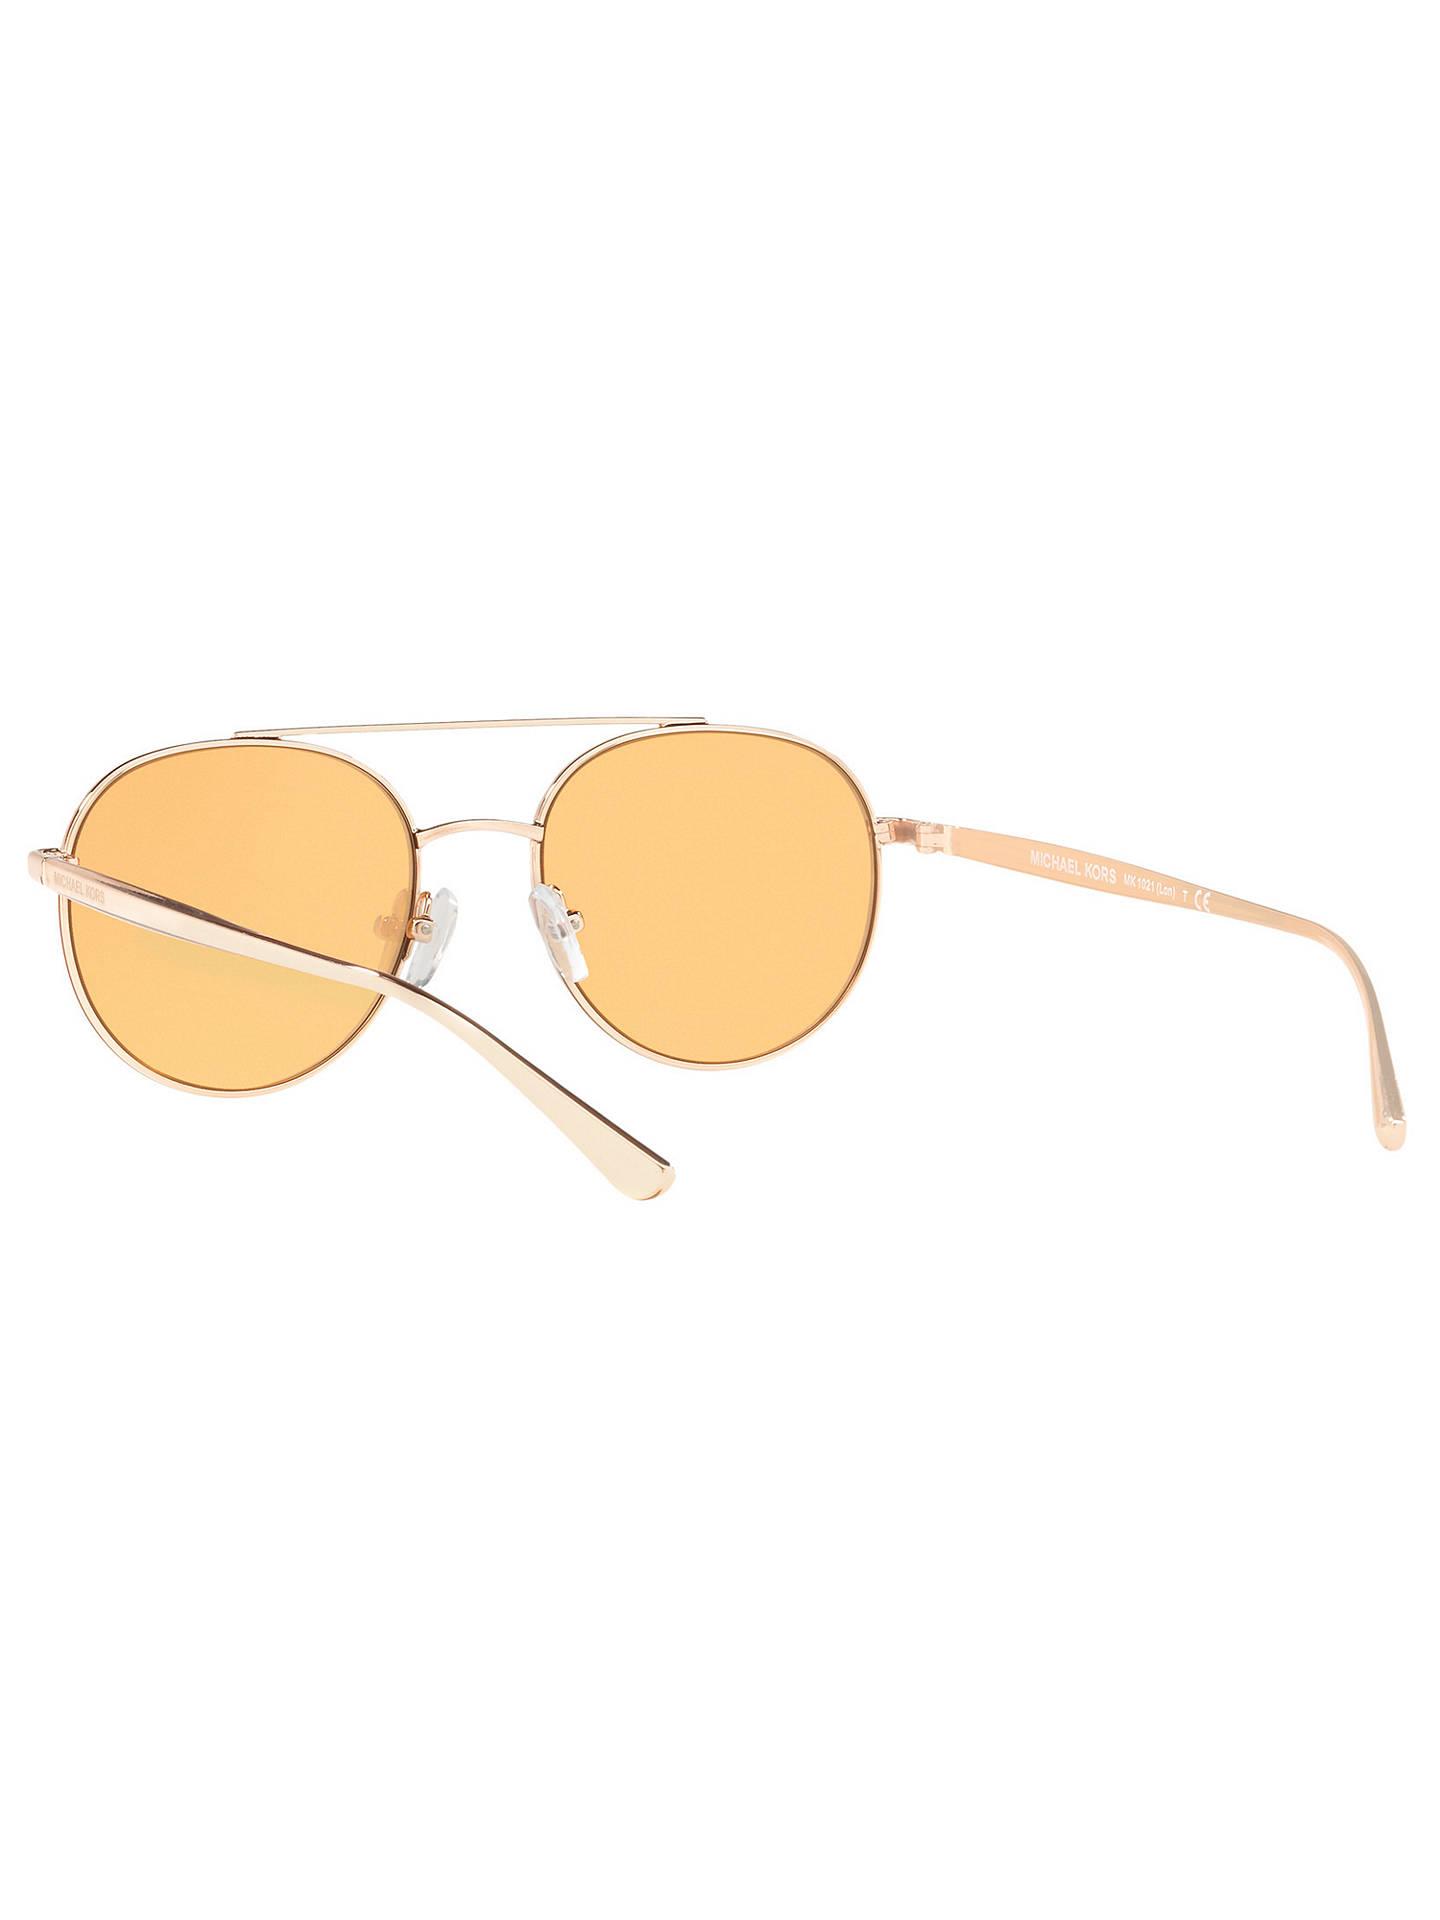 9eb3f47af ... Buy Michael Kors MK1021 Lon Round Aviator Sunglasses, Gold/Mirror  Orange Online at johnlewis ...